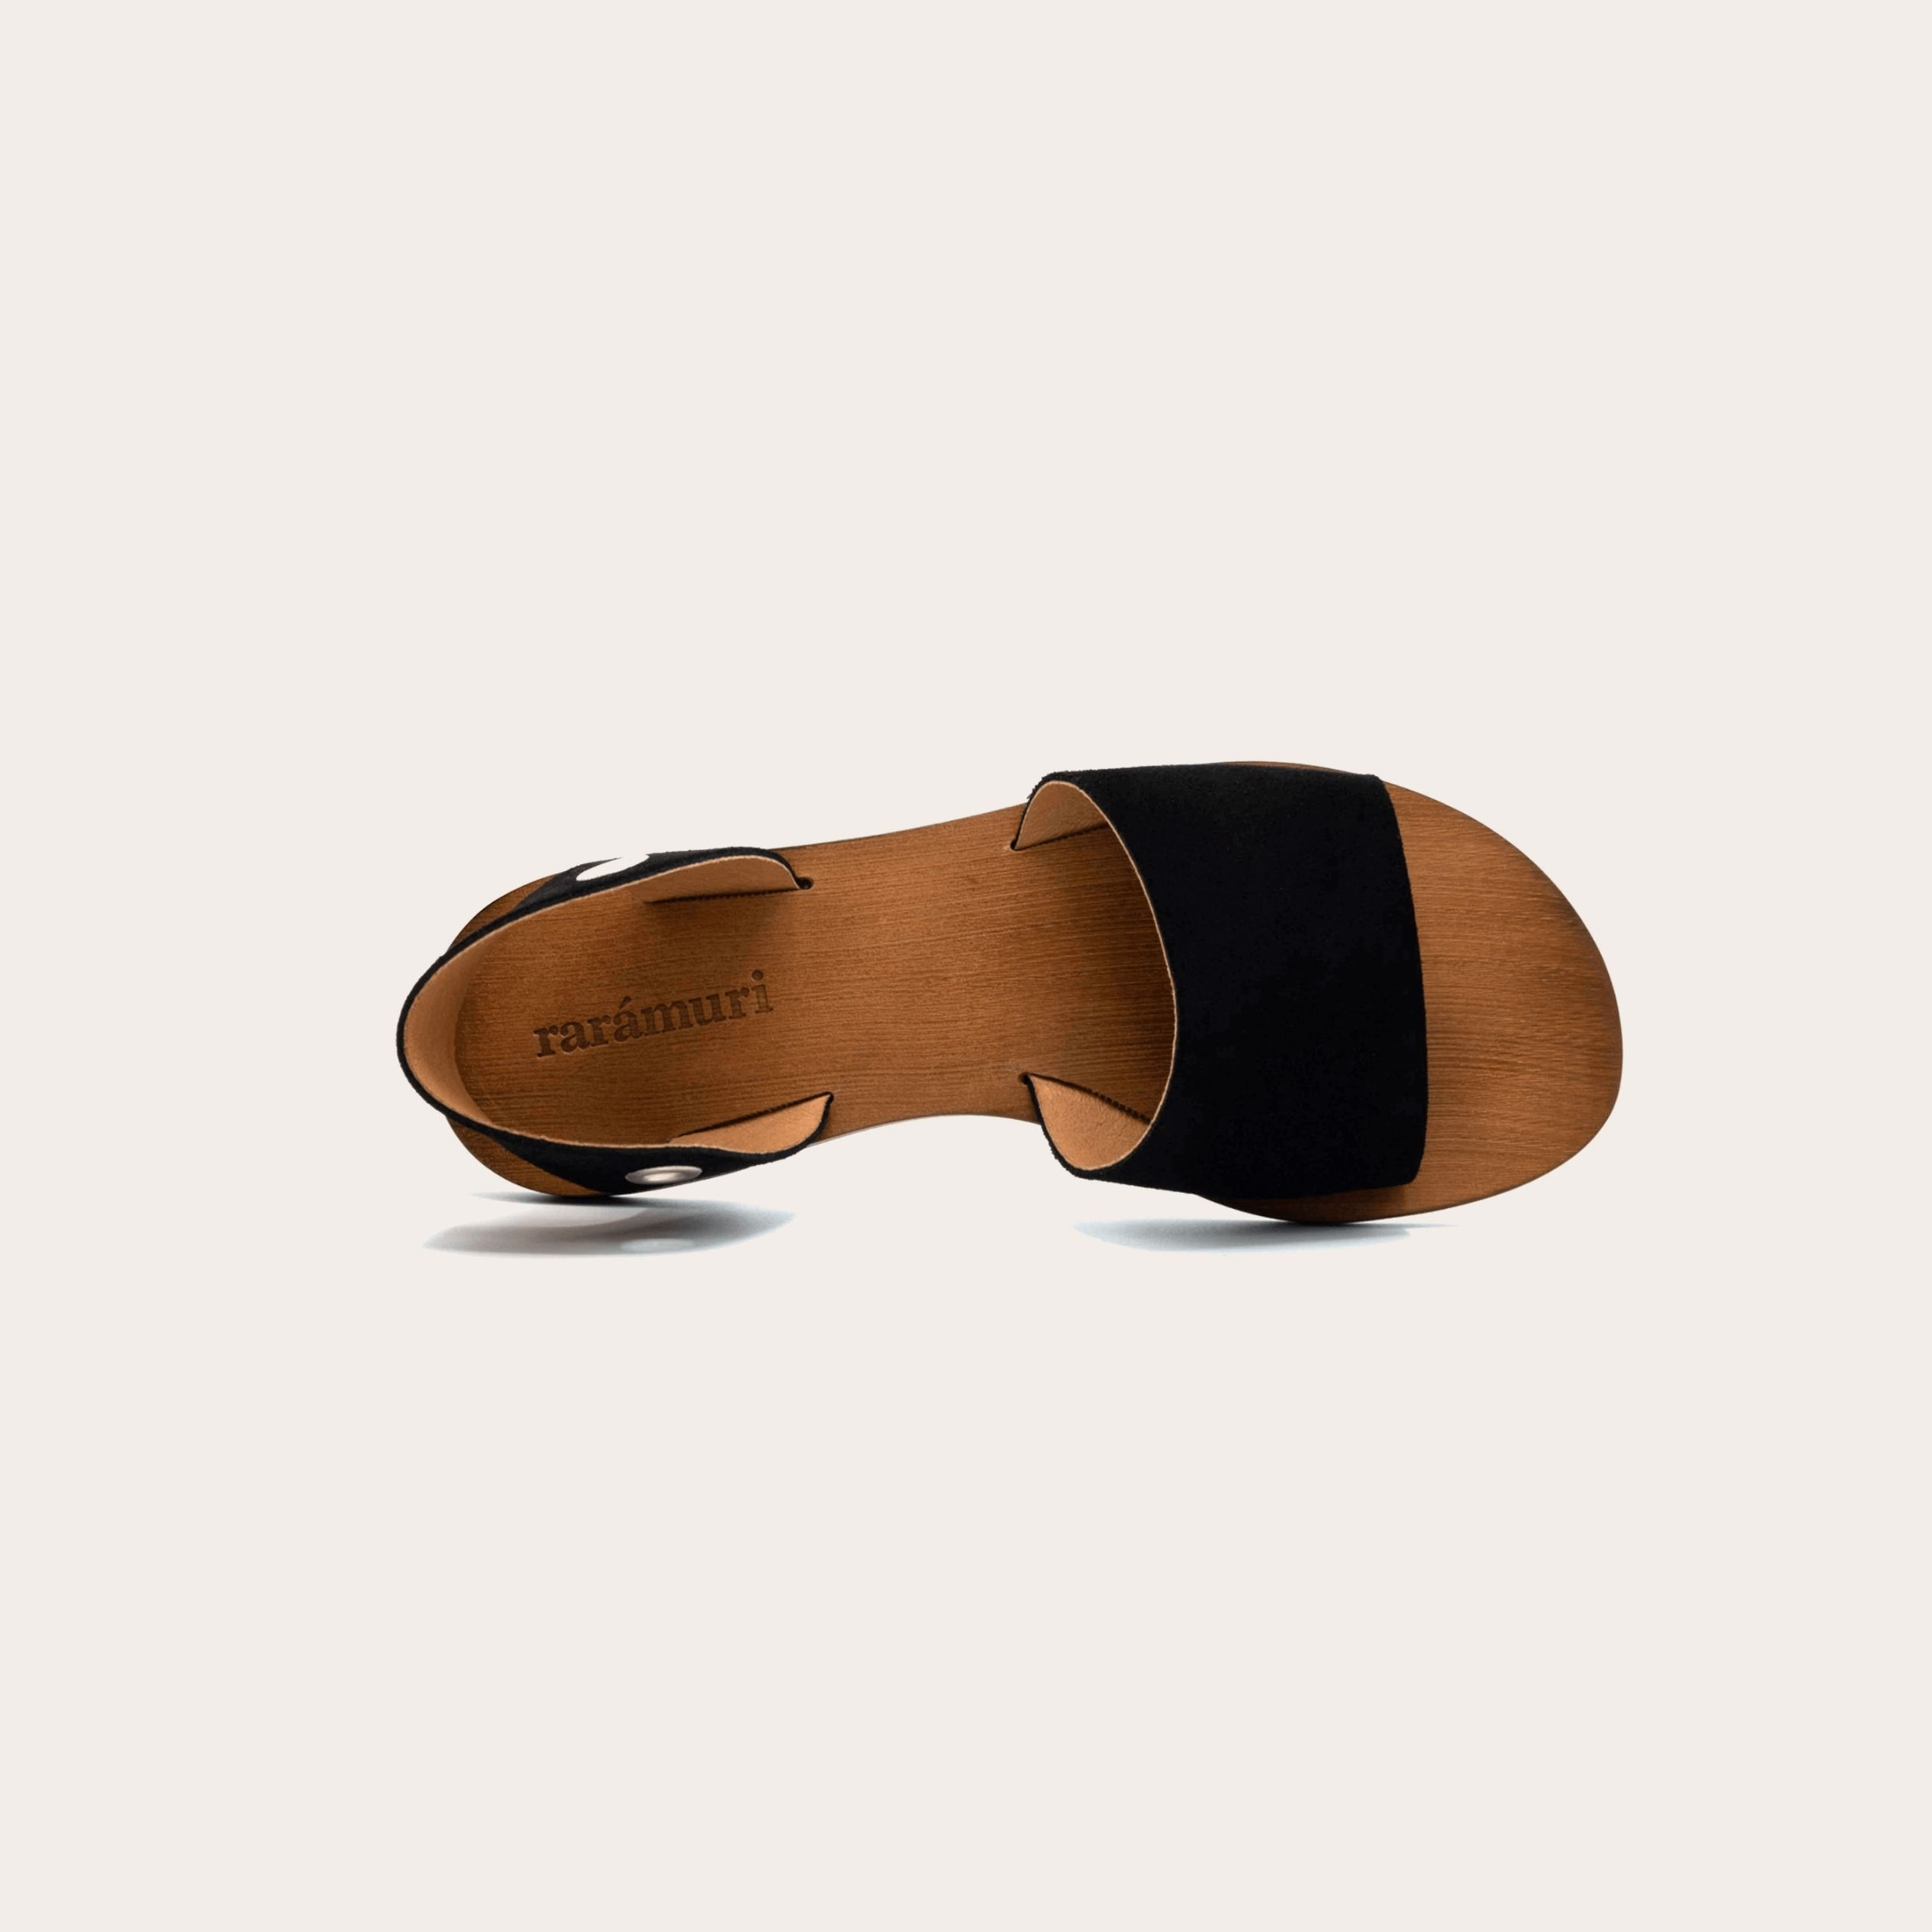 acapulco-black_3_lintsandalen sandals travelsandals vegan sustainable sandals wikkelsandalen